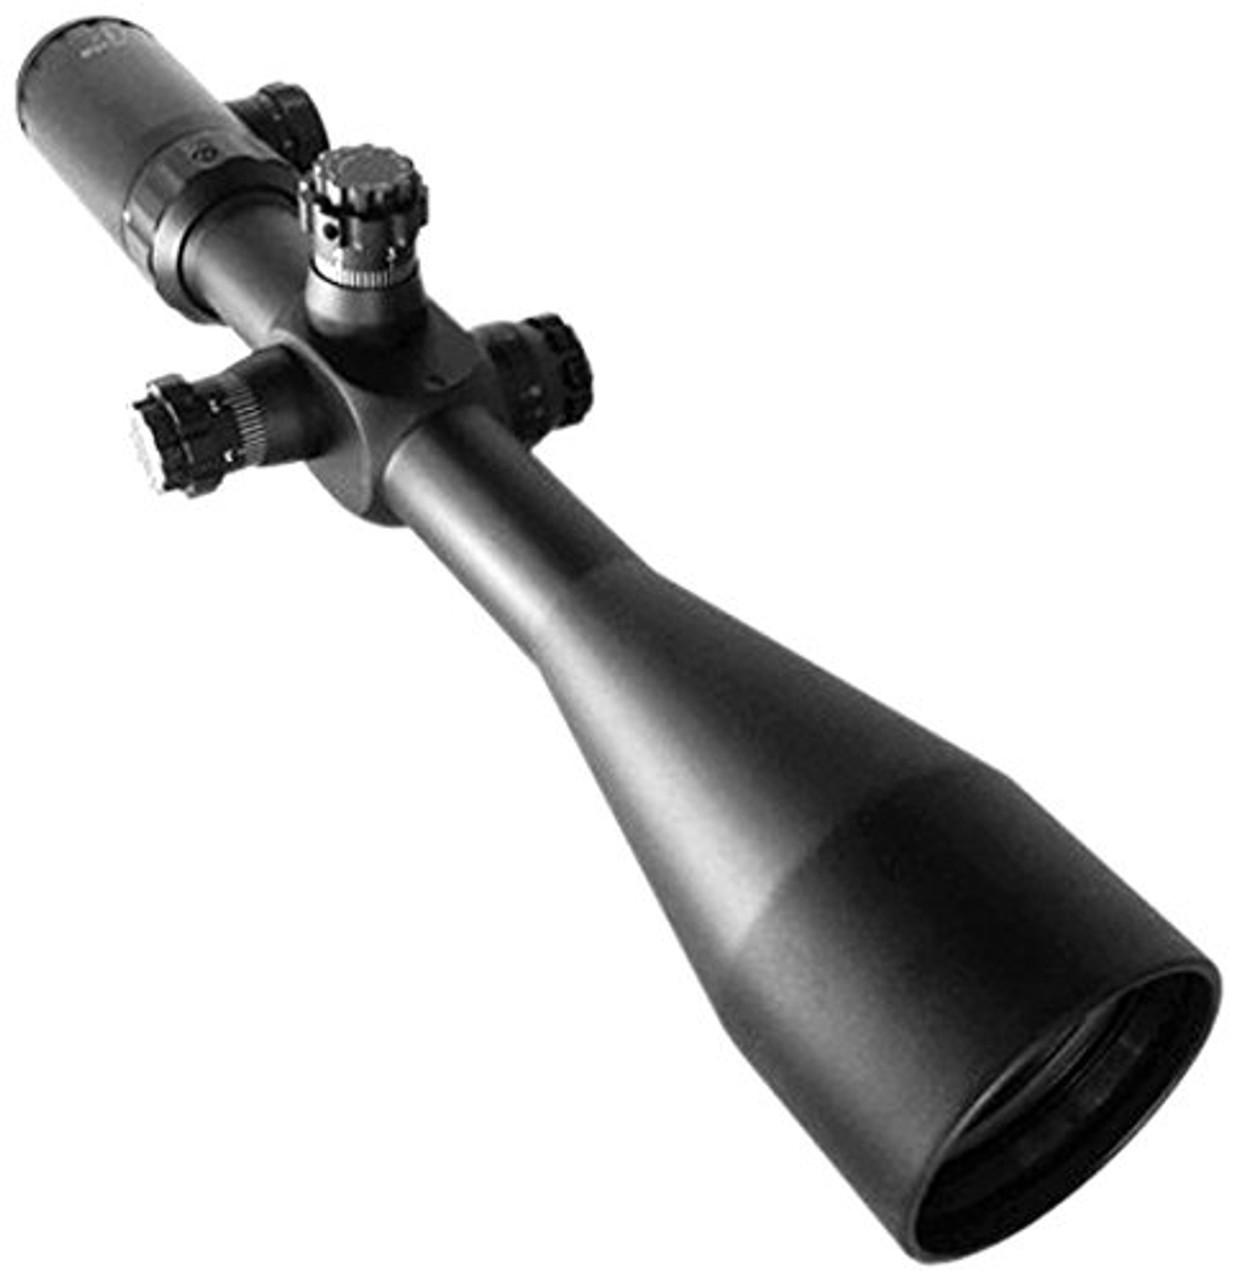 30mm Riflescope Ade Advanced Optics 3-25x56 Rifle Scope with  Iluminated Mildot